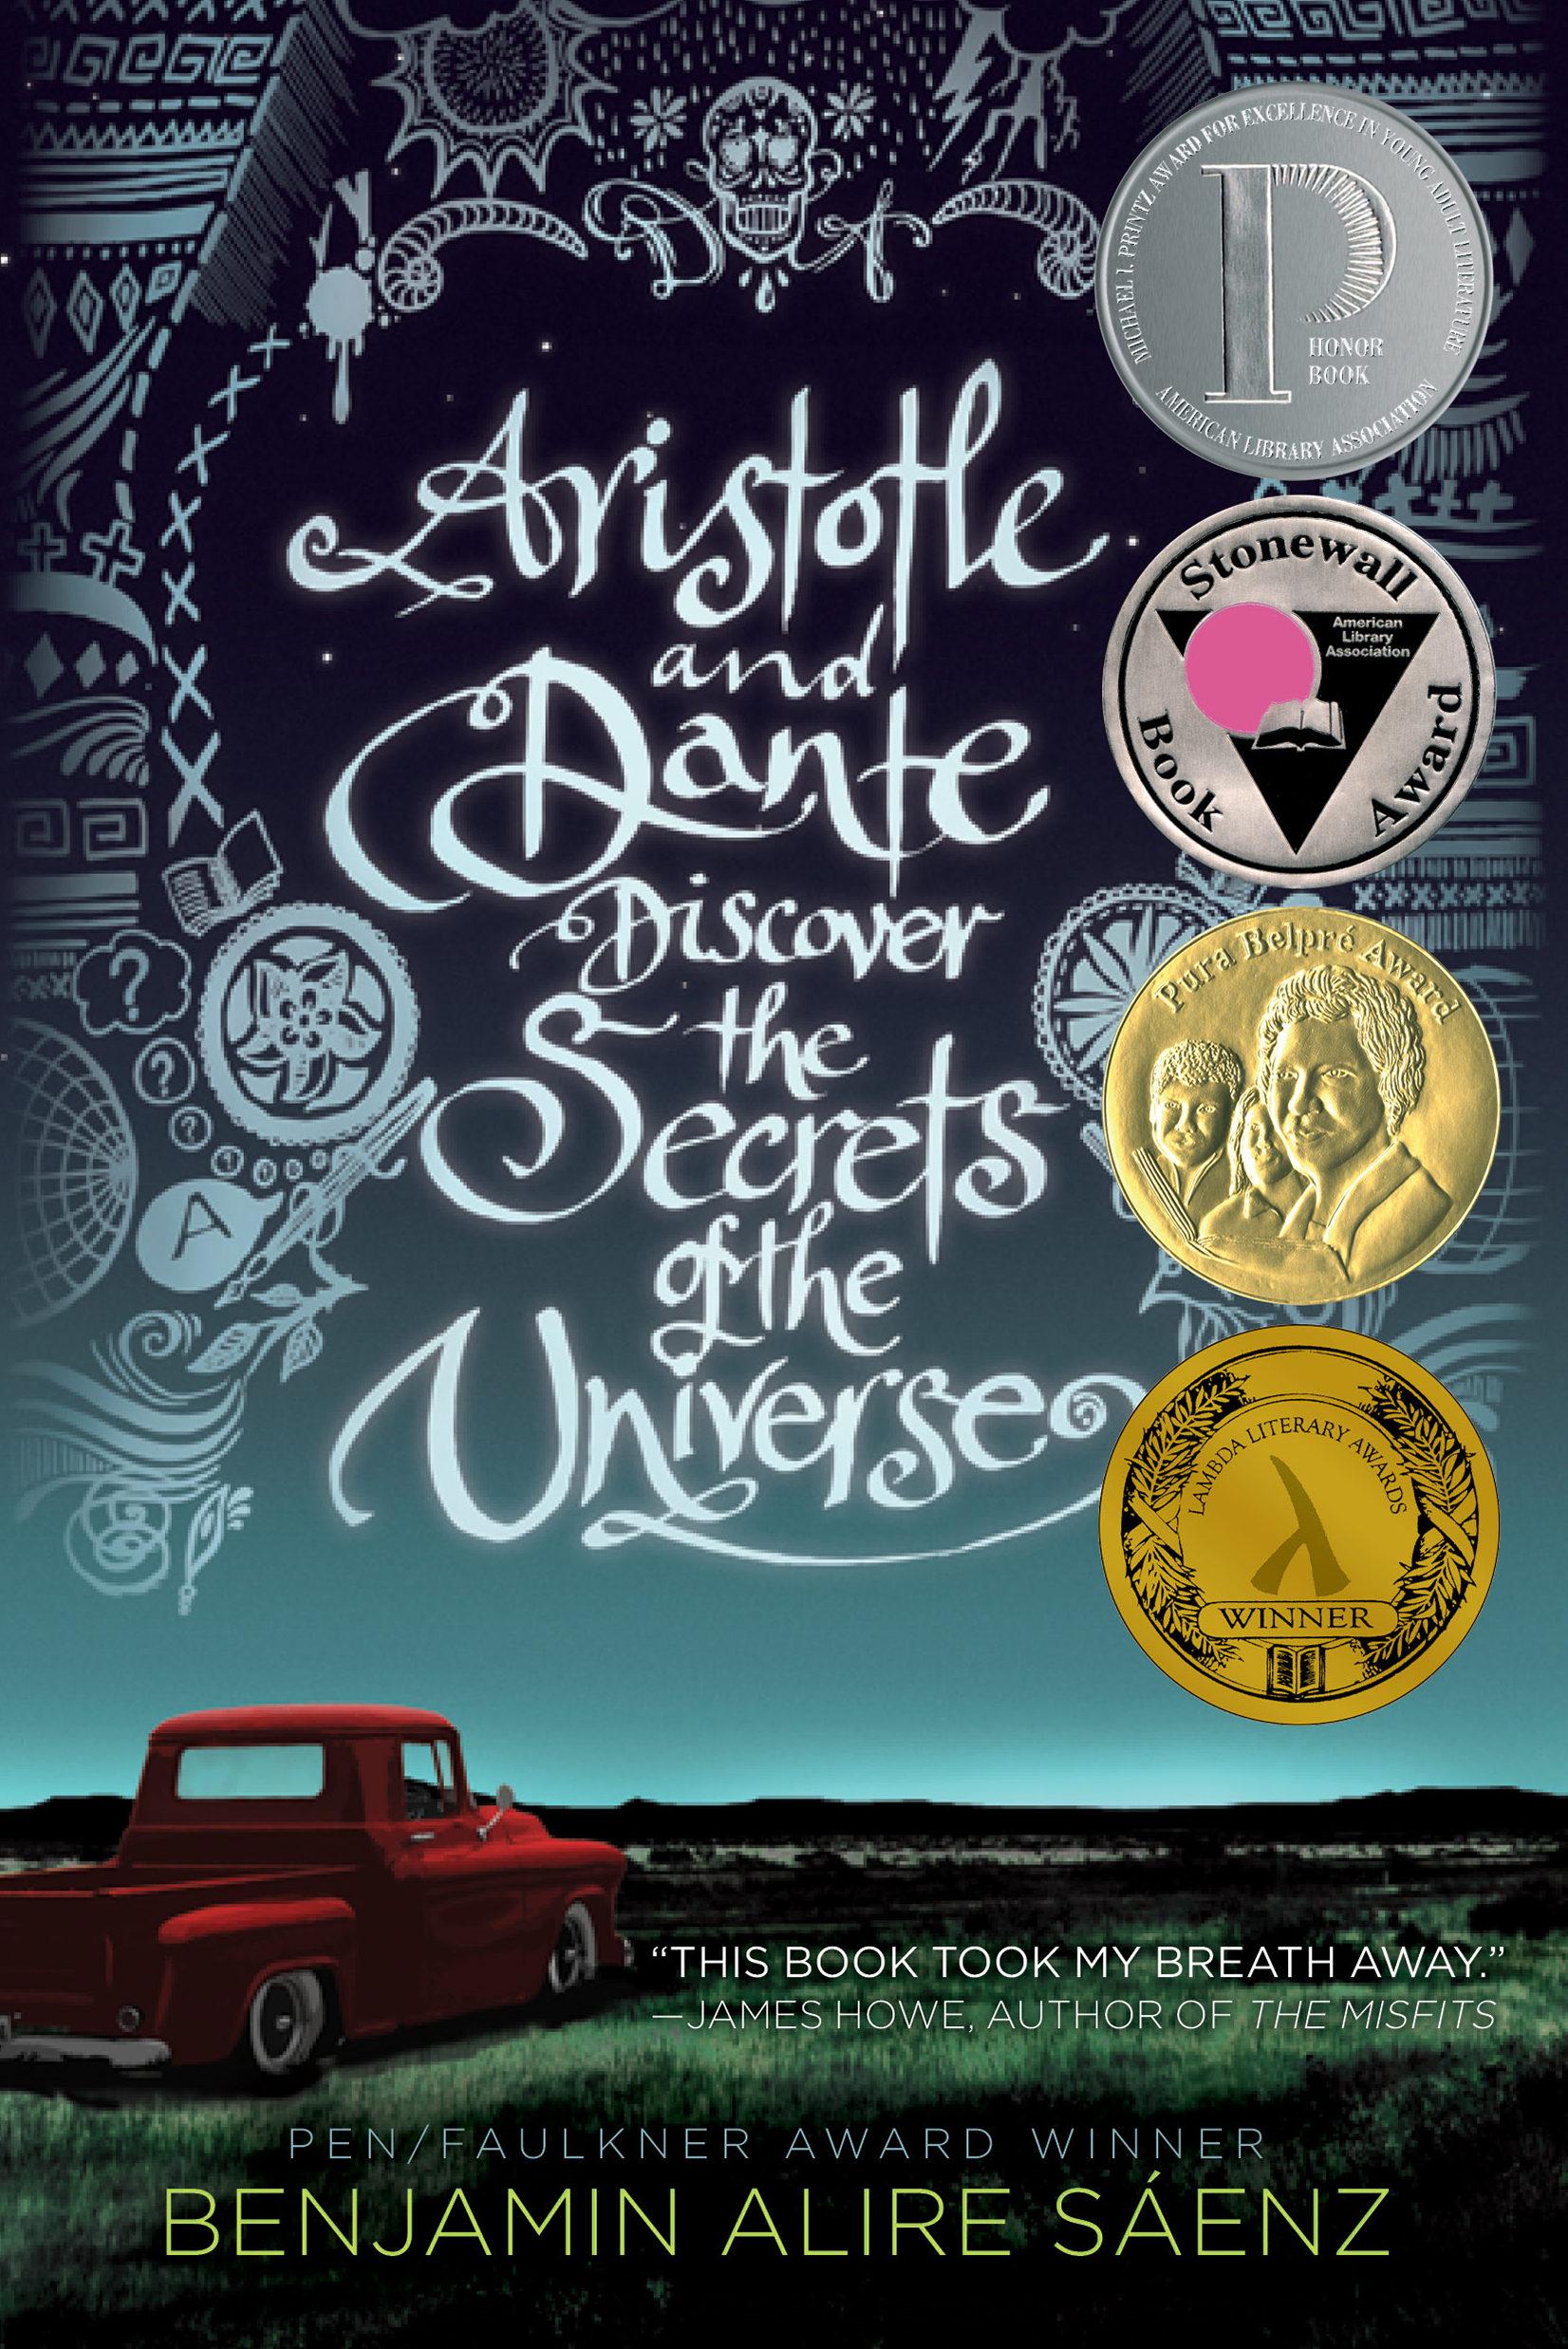 aristotle and dante discover the secrets of the universe-benjamin alire saenz-9781442408937